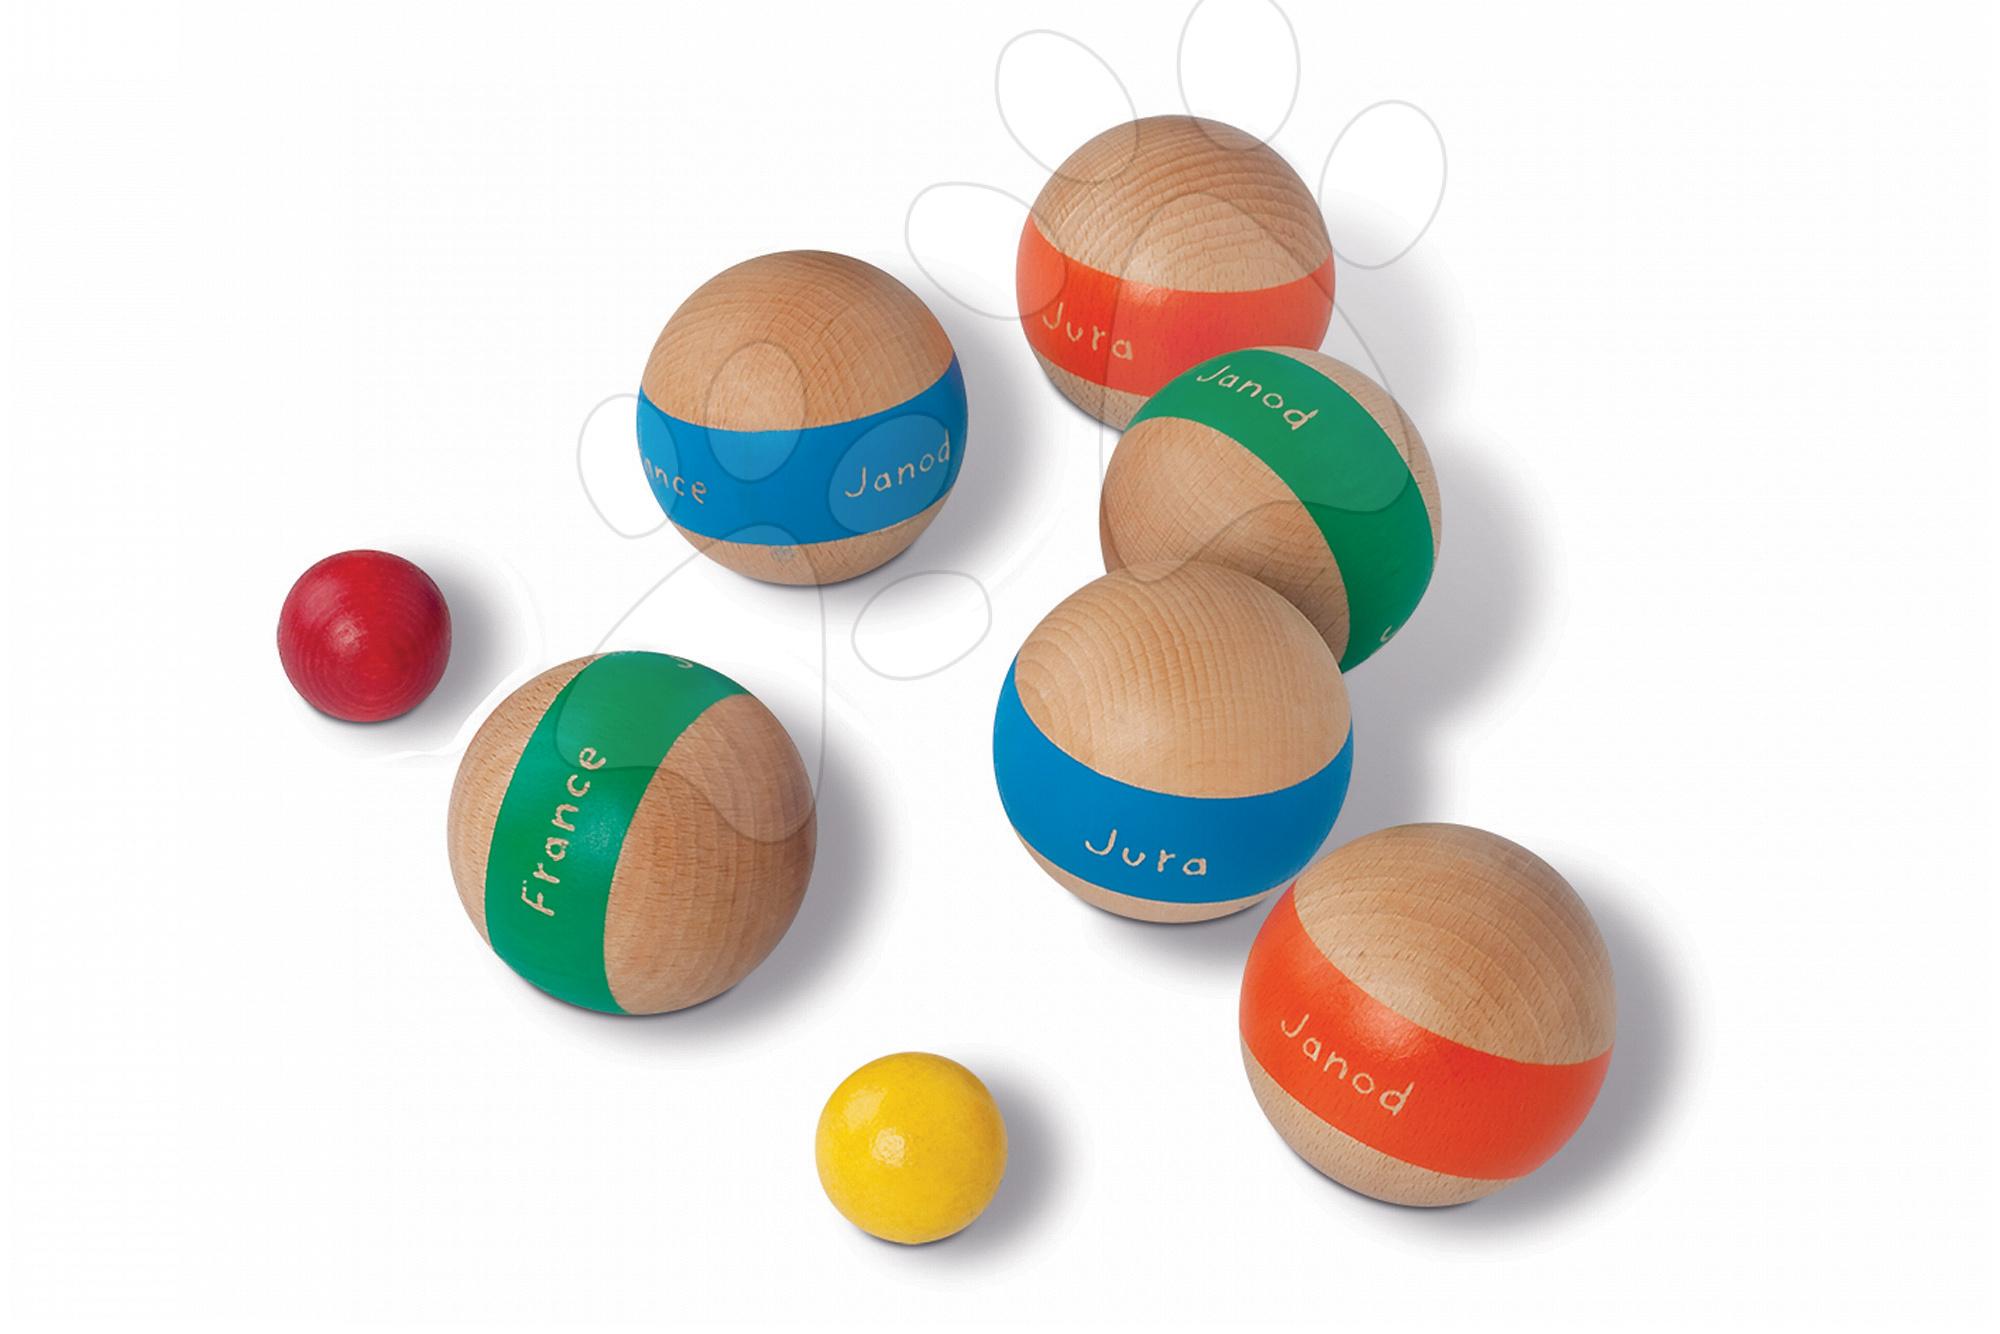 Petang - Drevené gule petanque 6 Bowls in a Basket Janod od 5 rokov